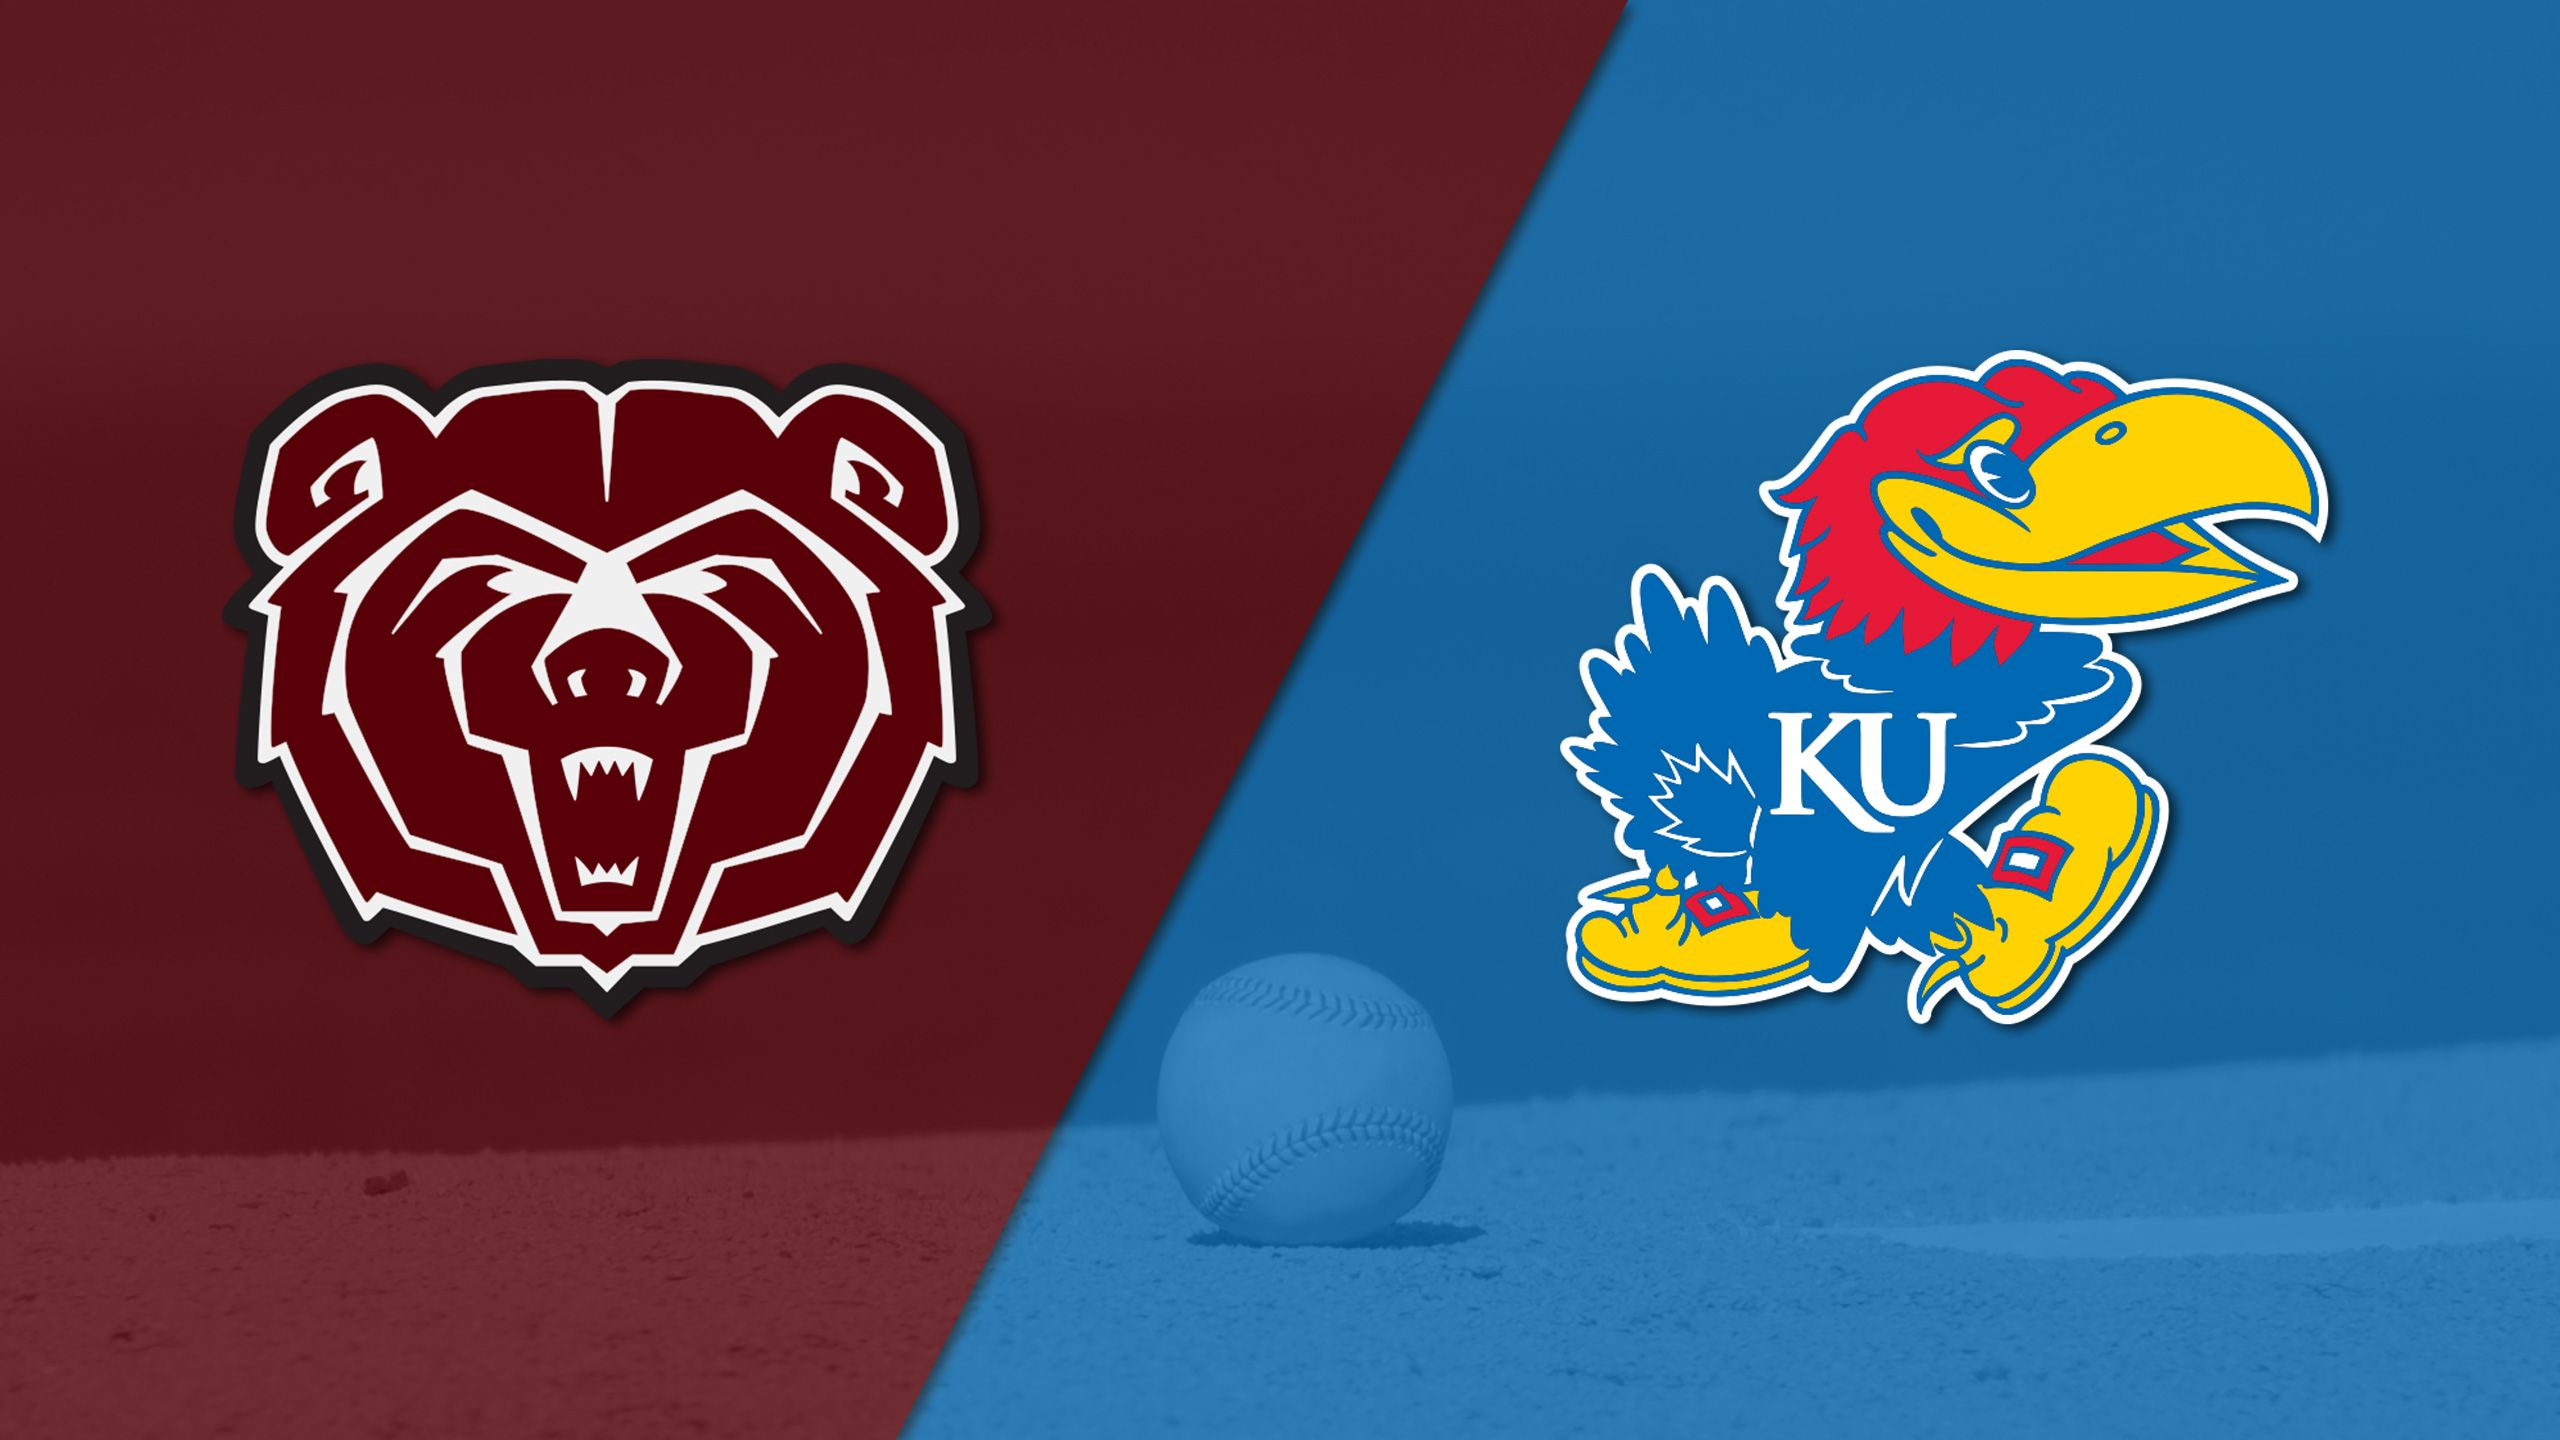 #24 Missouri State vs. Kansas (Baseball)